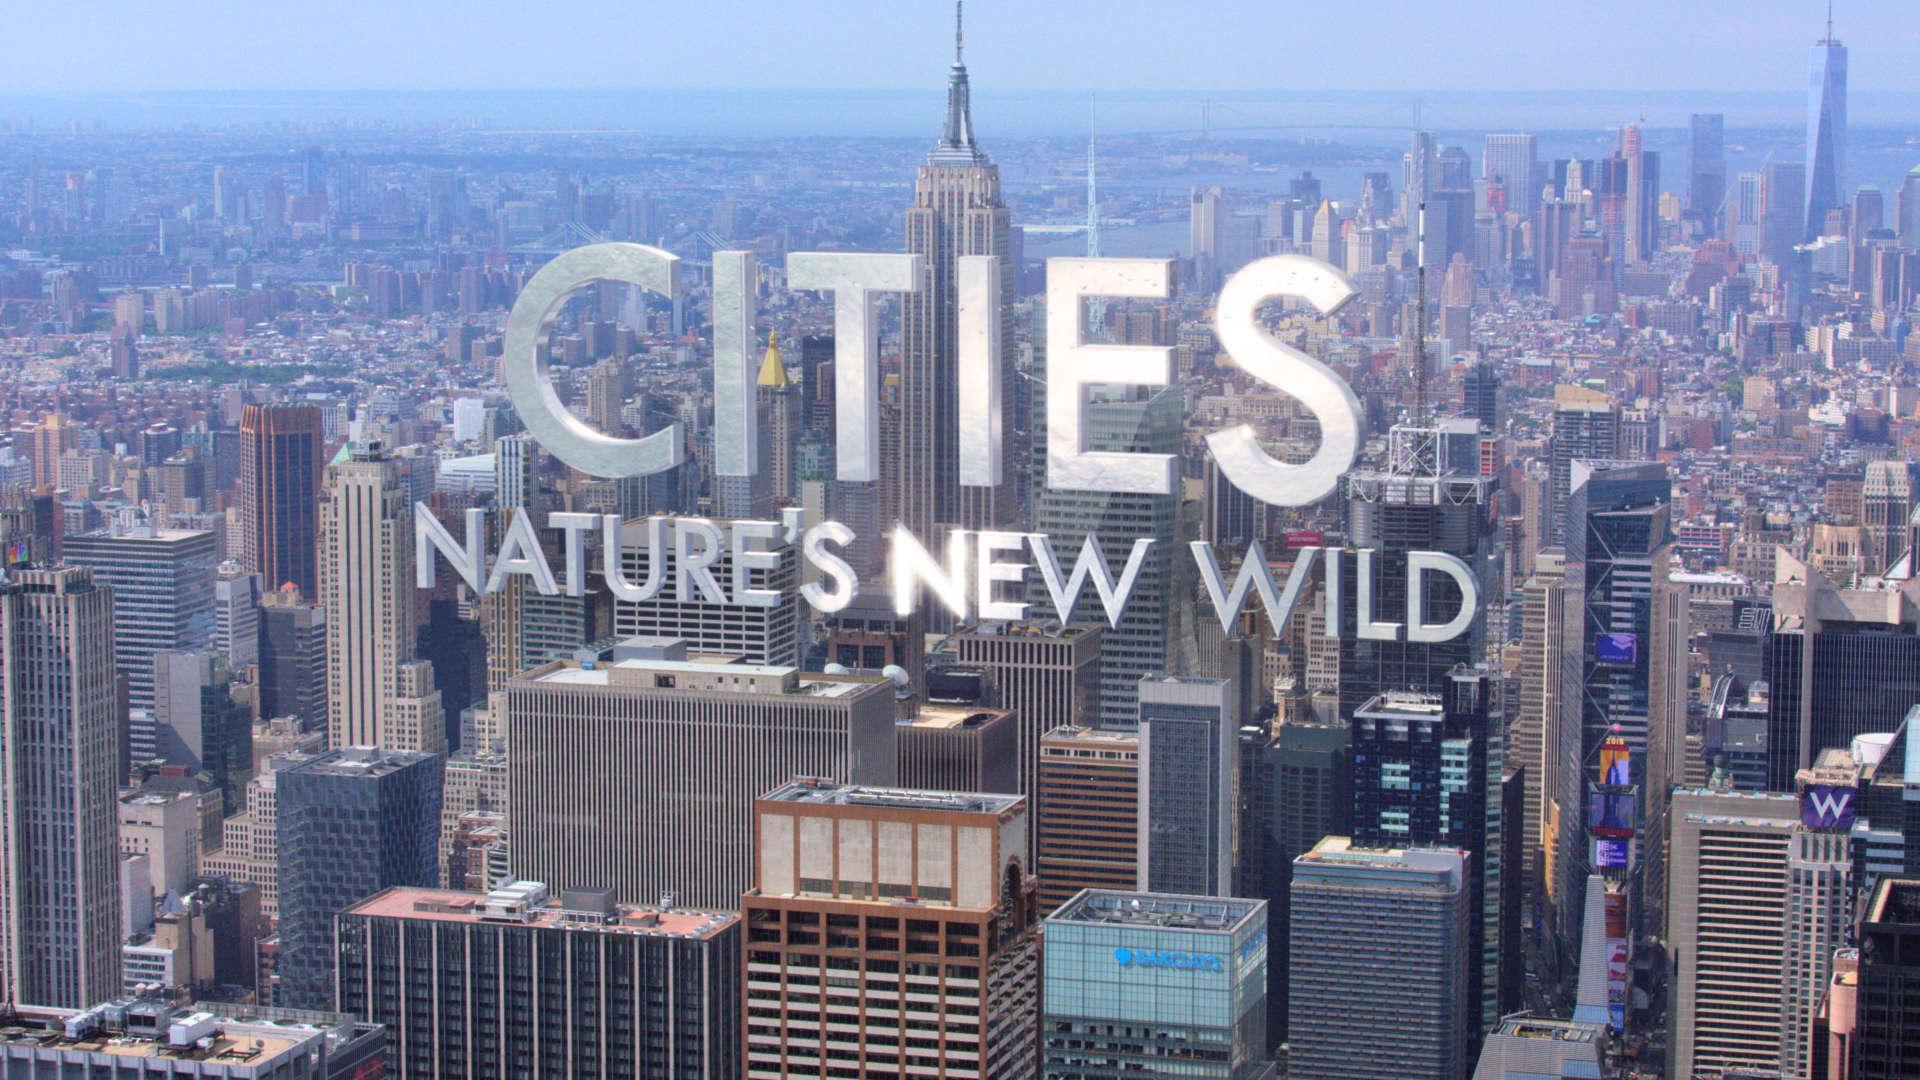 Cites-Natures-New-Wild-trailer-0-00-35-22.jpg